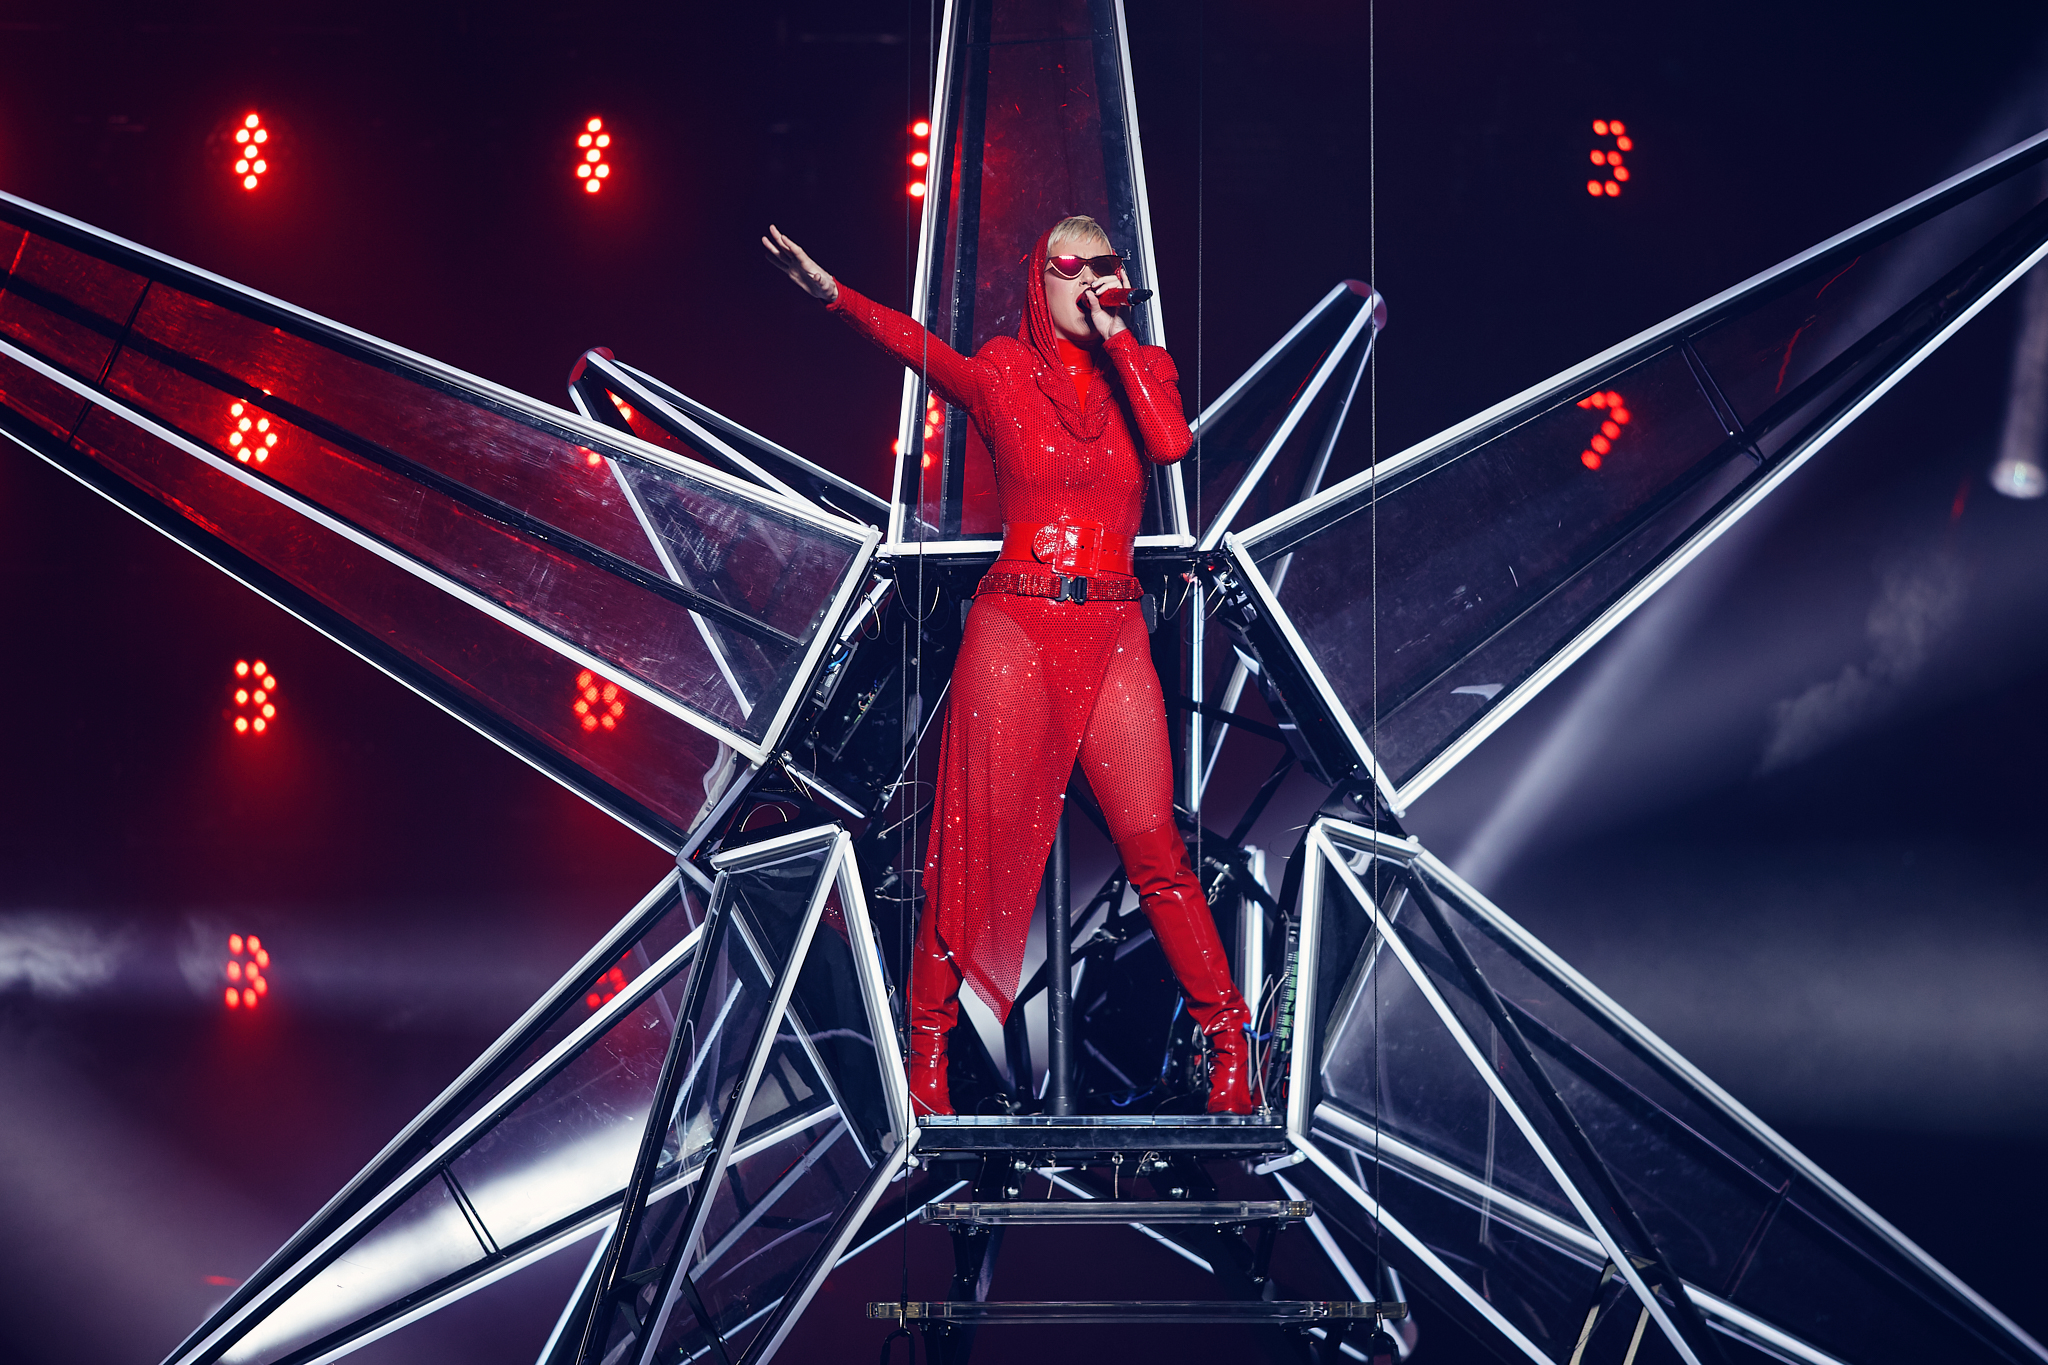 Katy_Perry_At_Xcel_Energy_Center_12-01-2017_Photo_By_Joe_Lemke_004.jpg